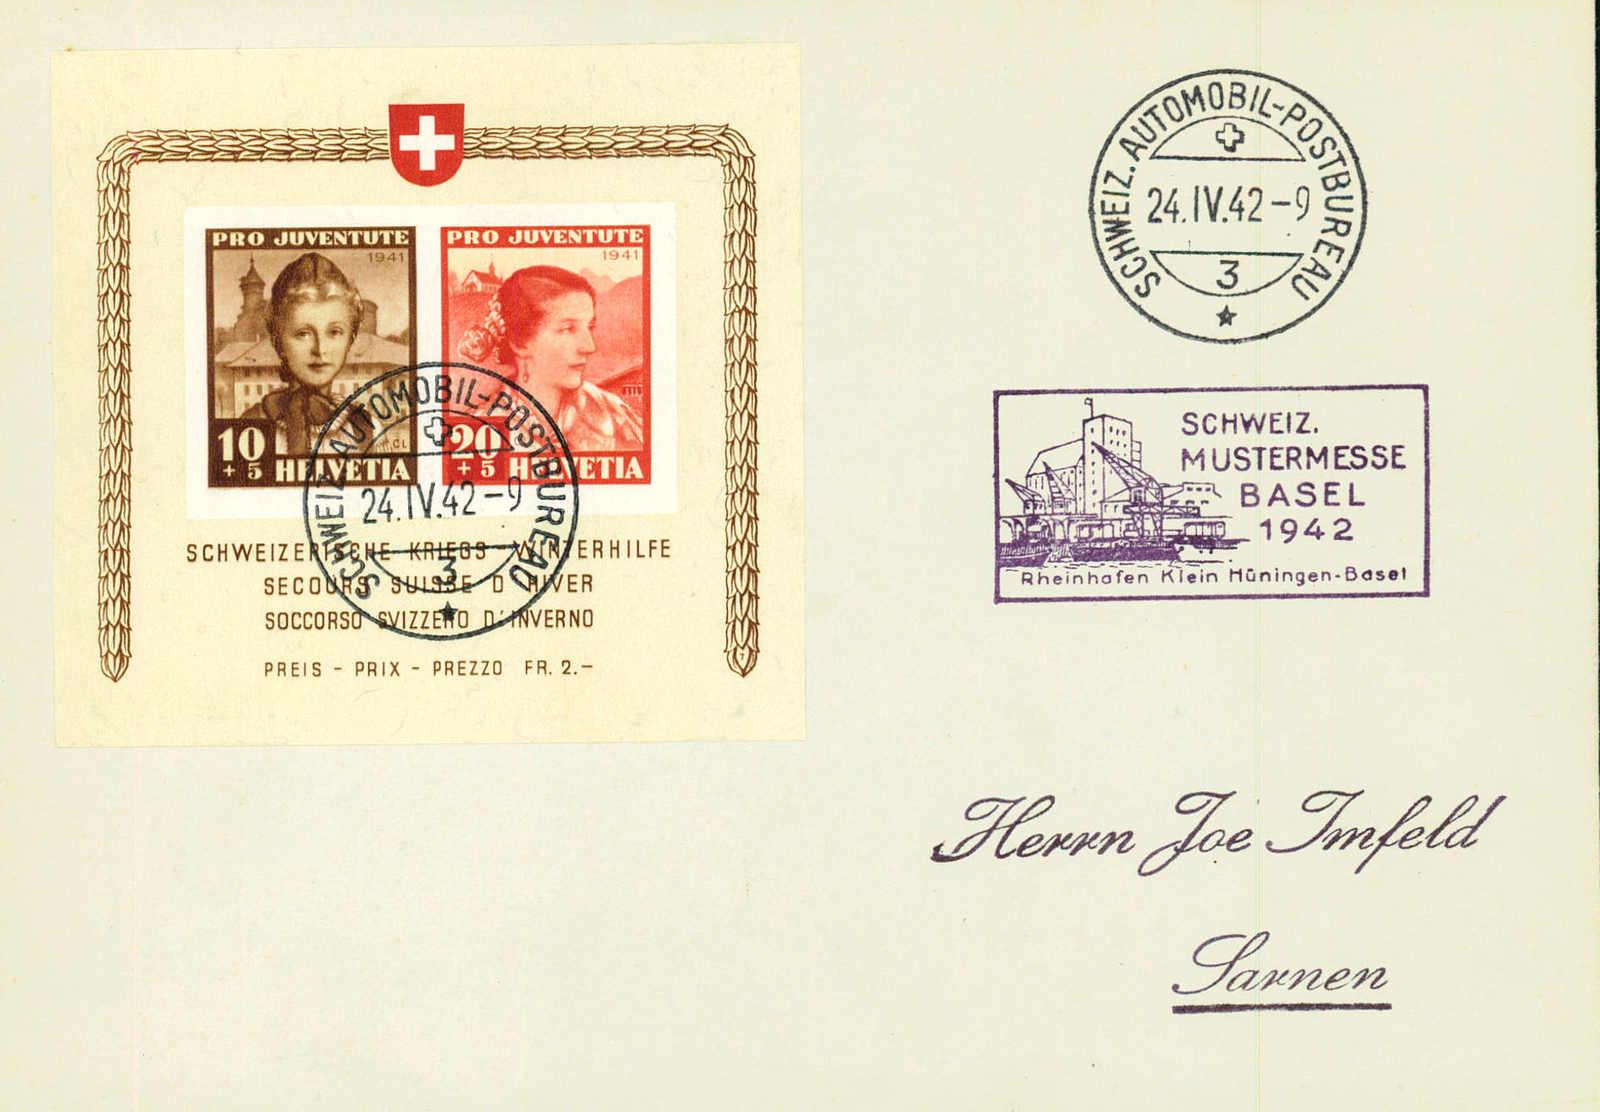 Lot 1051 - pro juventute  -  MH Marken GmbH Auktion 118